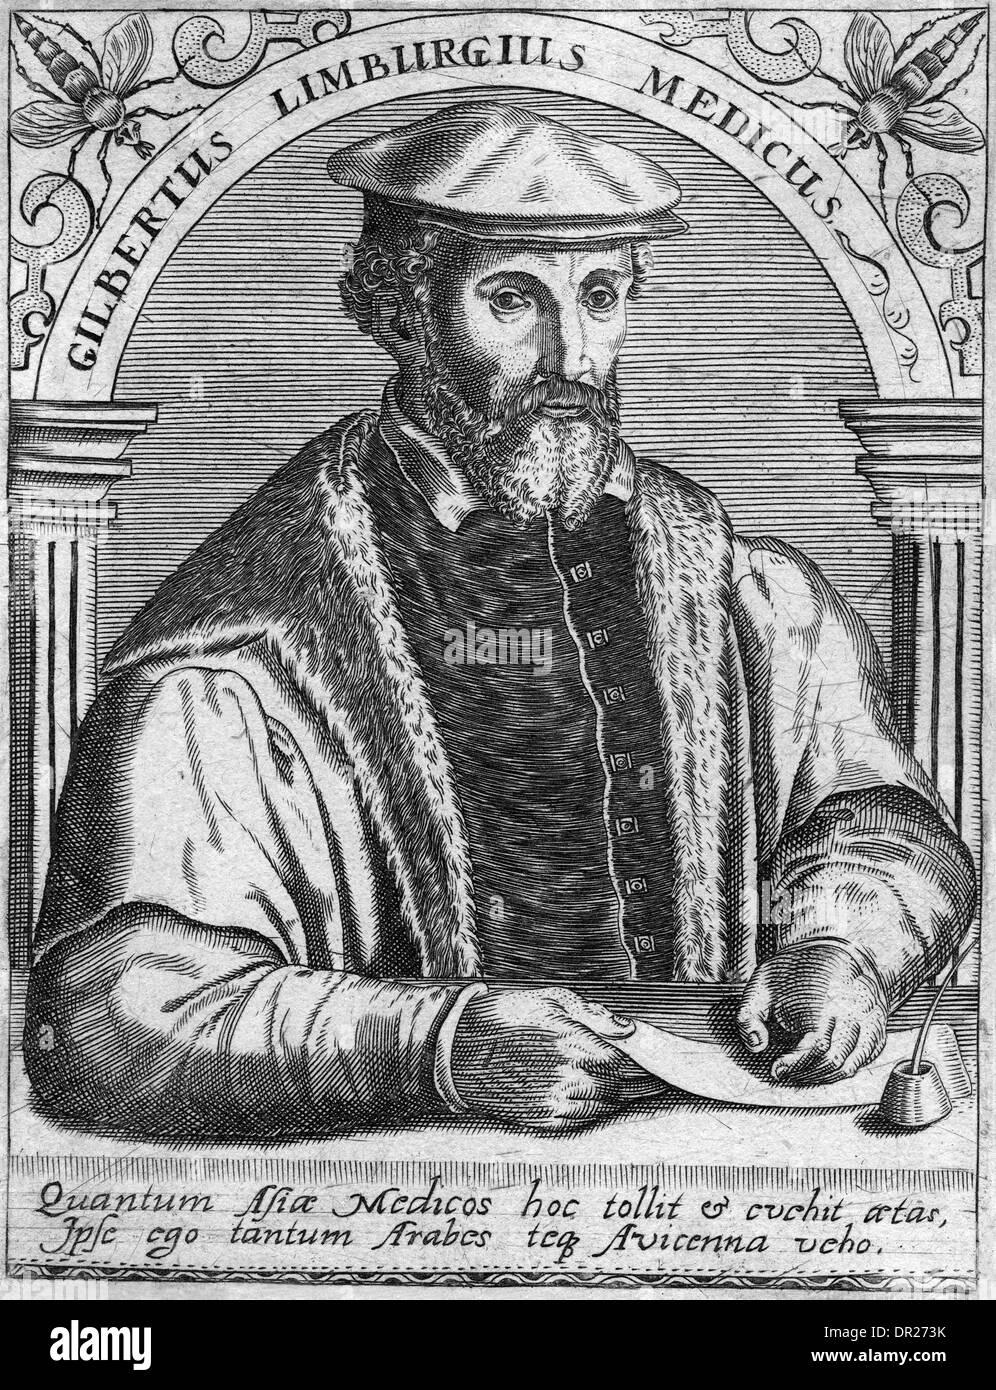 GILBERT OF LIMBURG - Stock Image